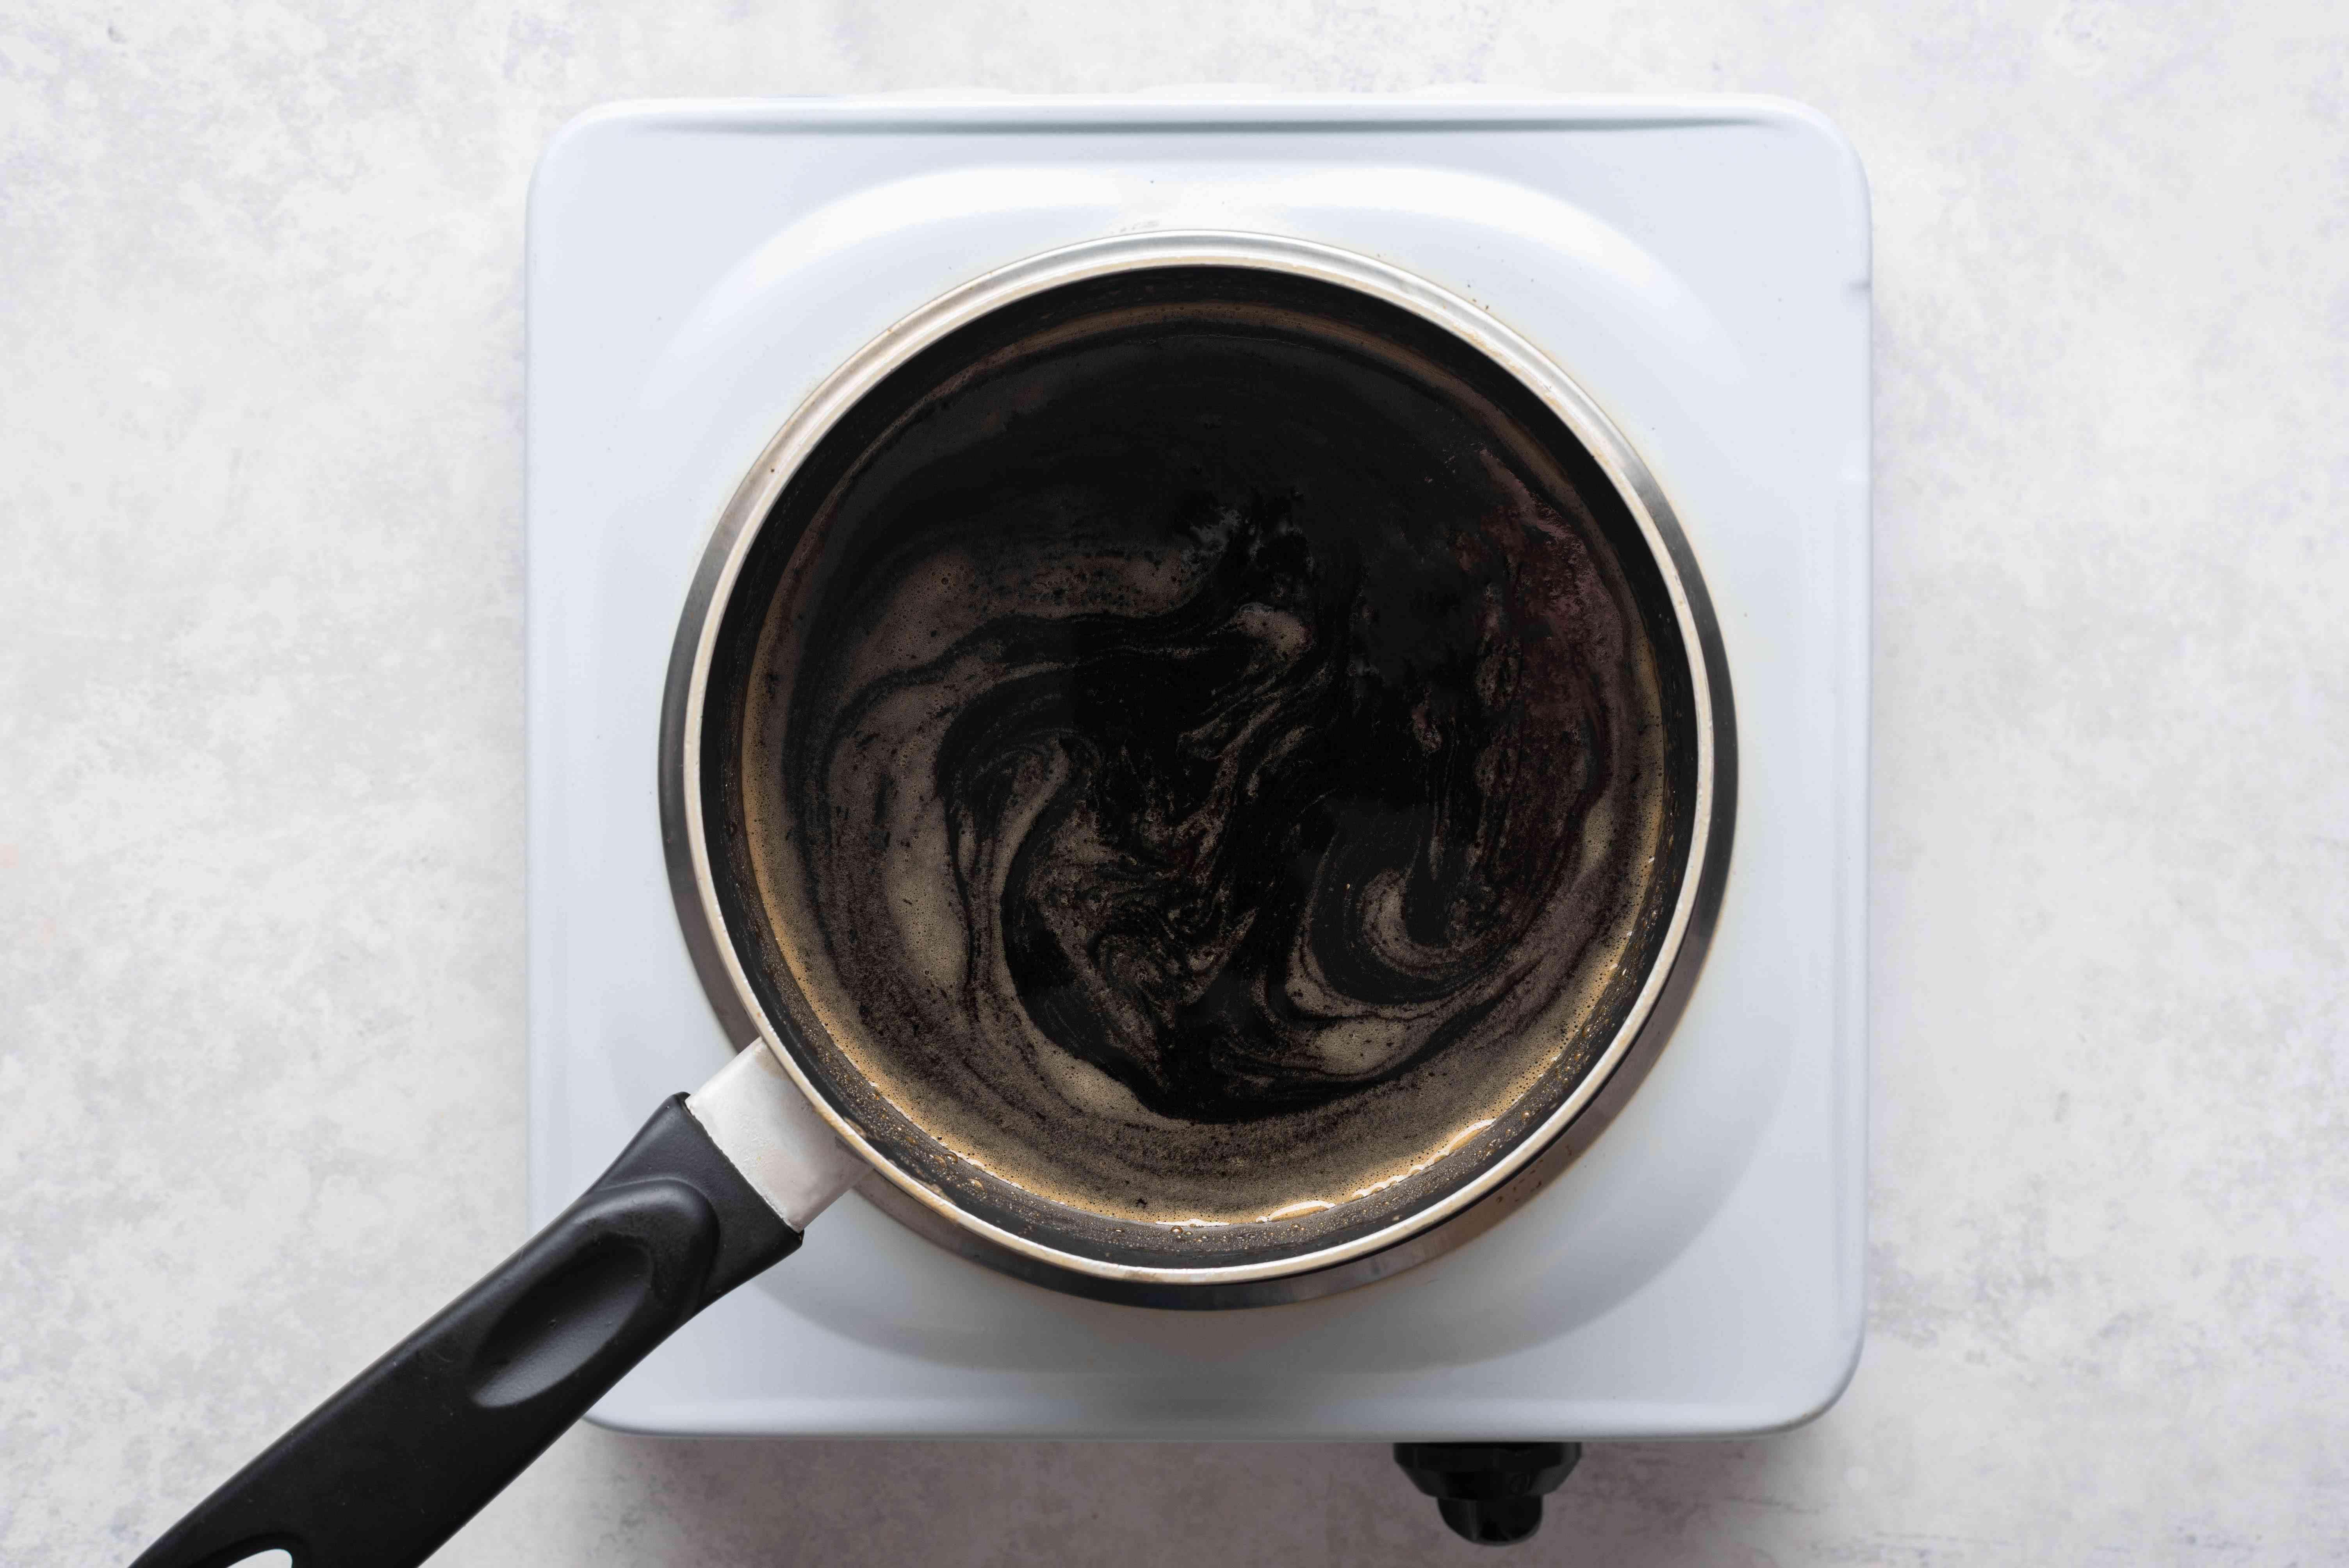 Place cider vinegar, brown sugar, white sugar, and lemon juice in a saucepan